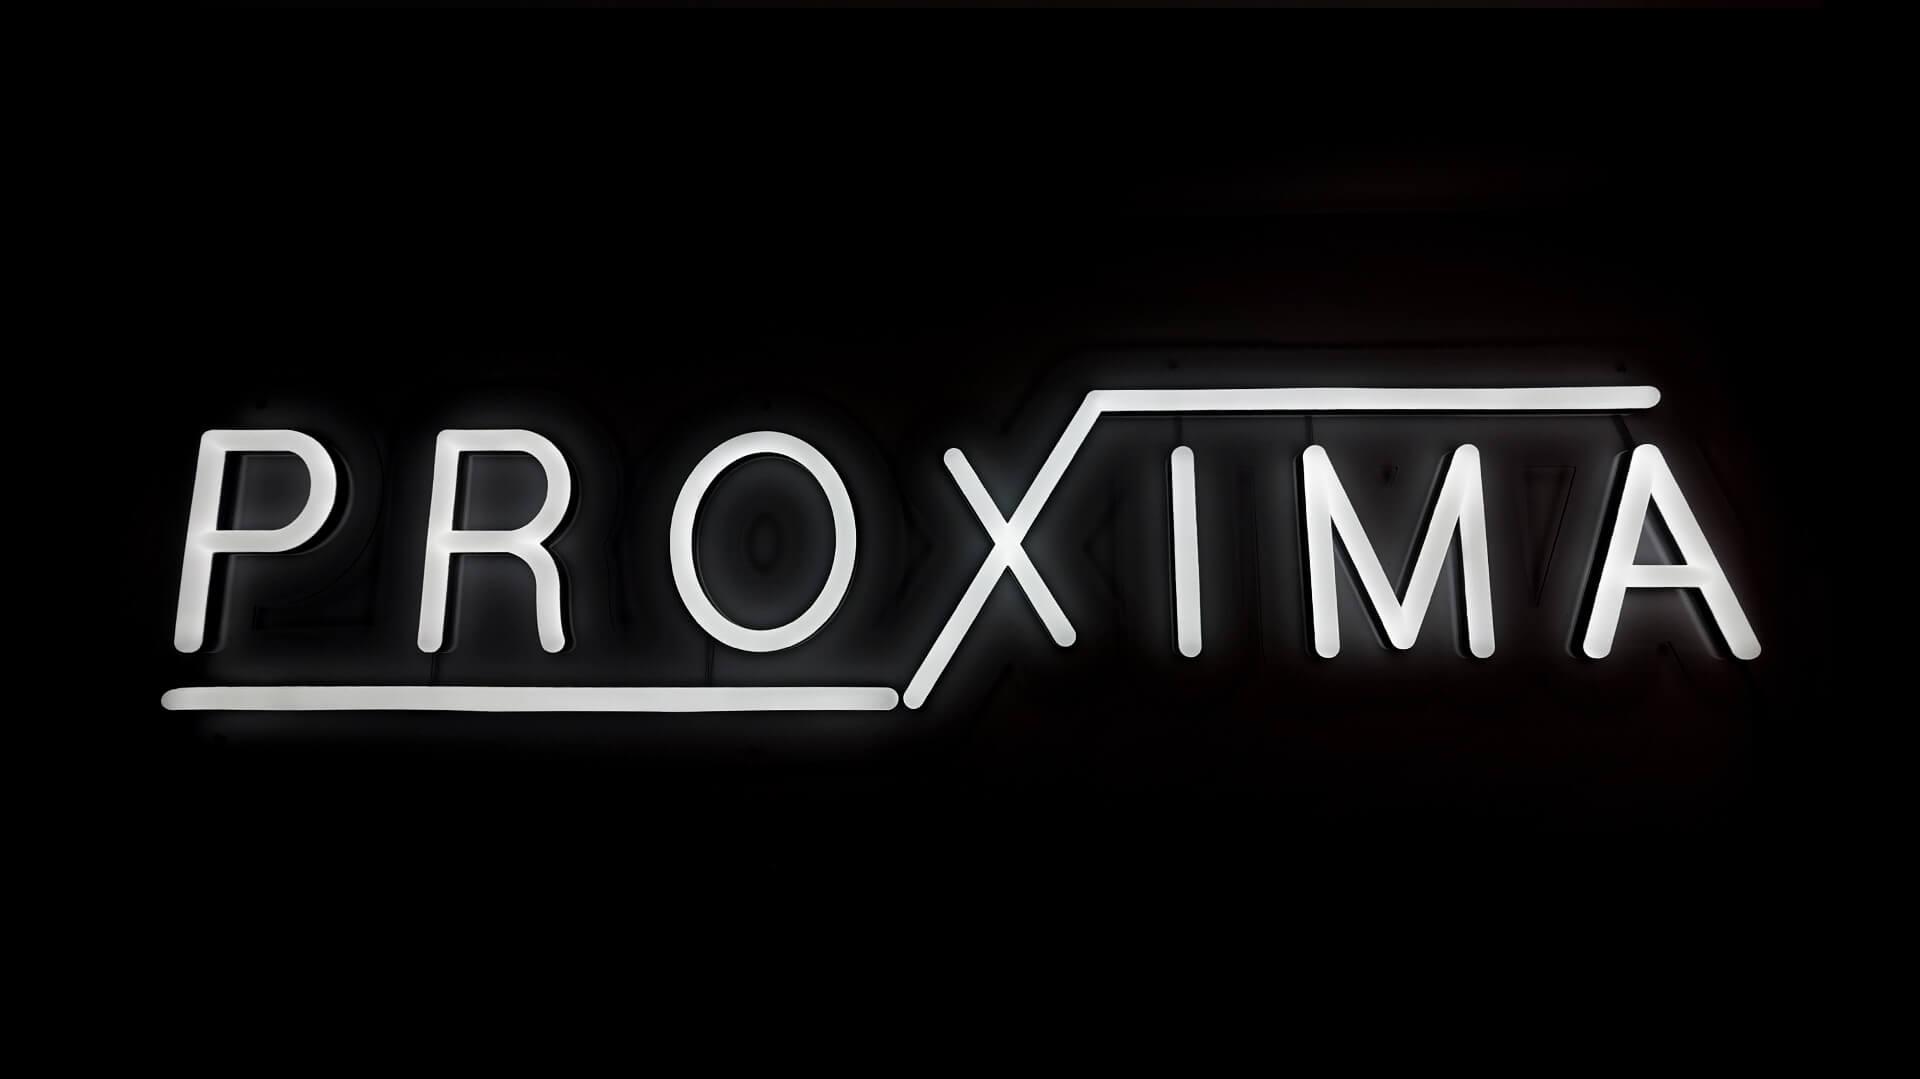 Custom logo neon sign for Proxima